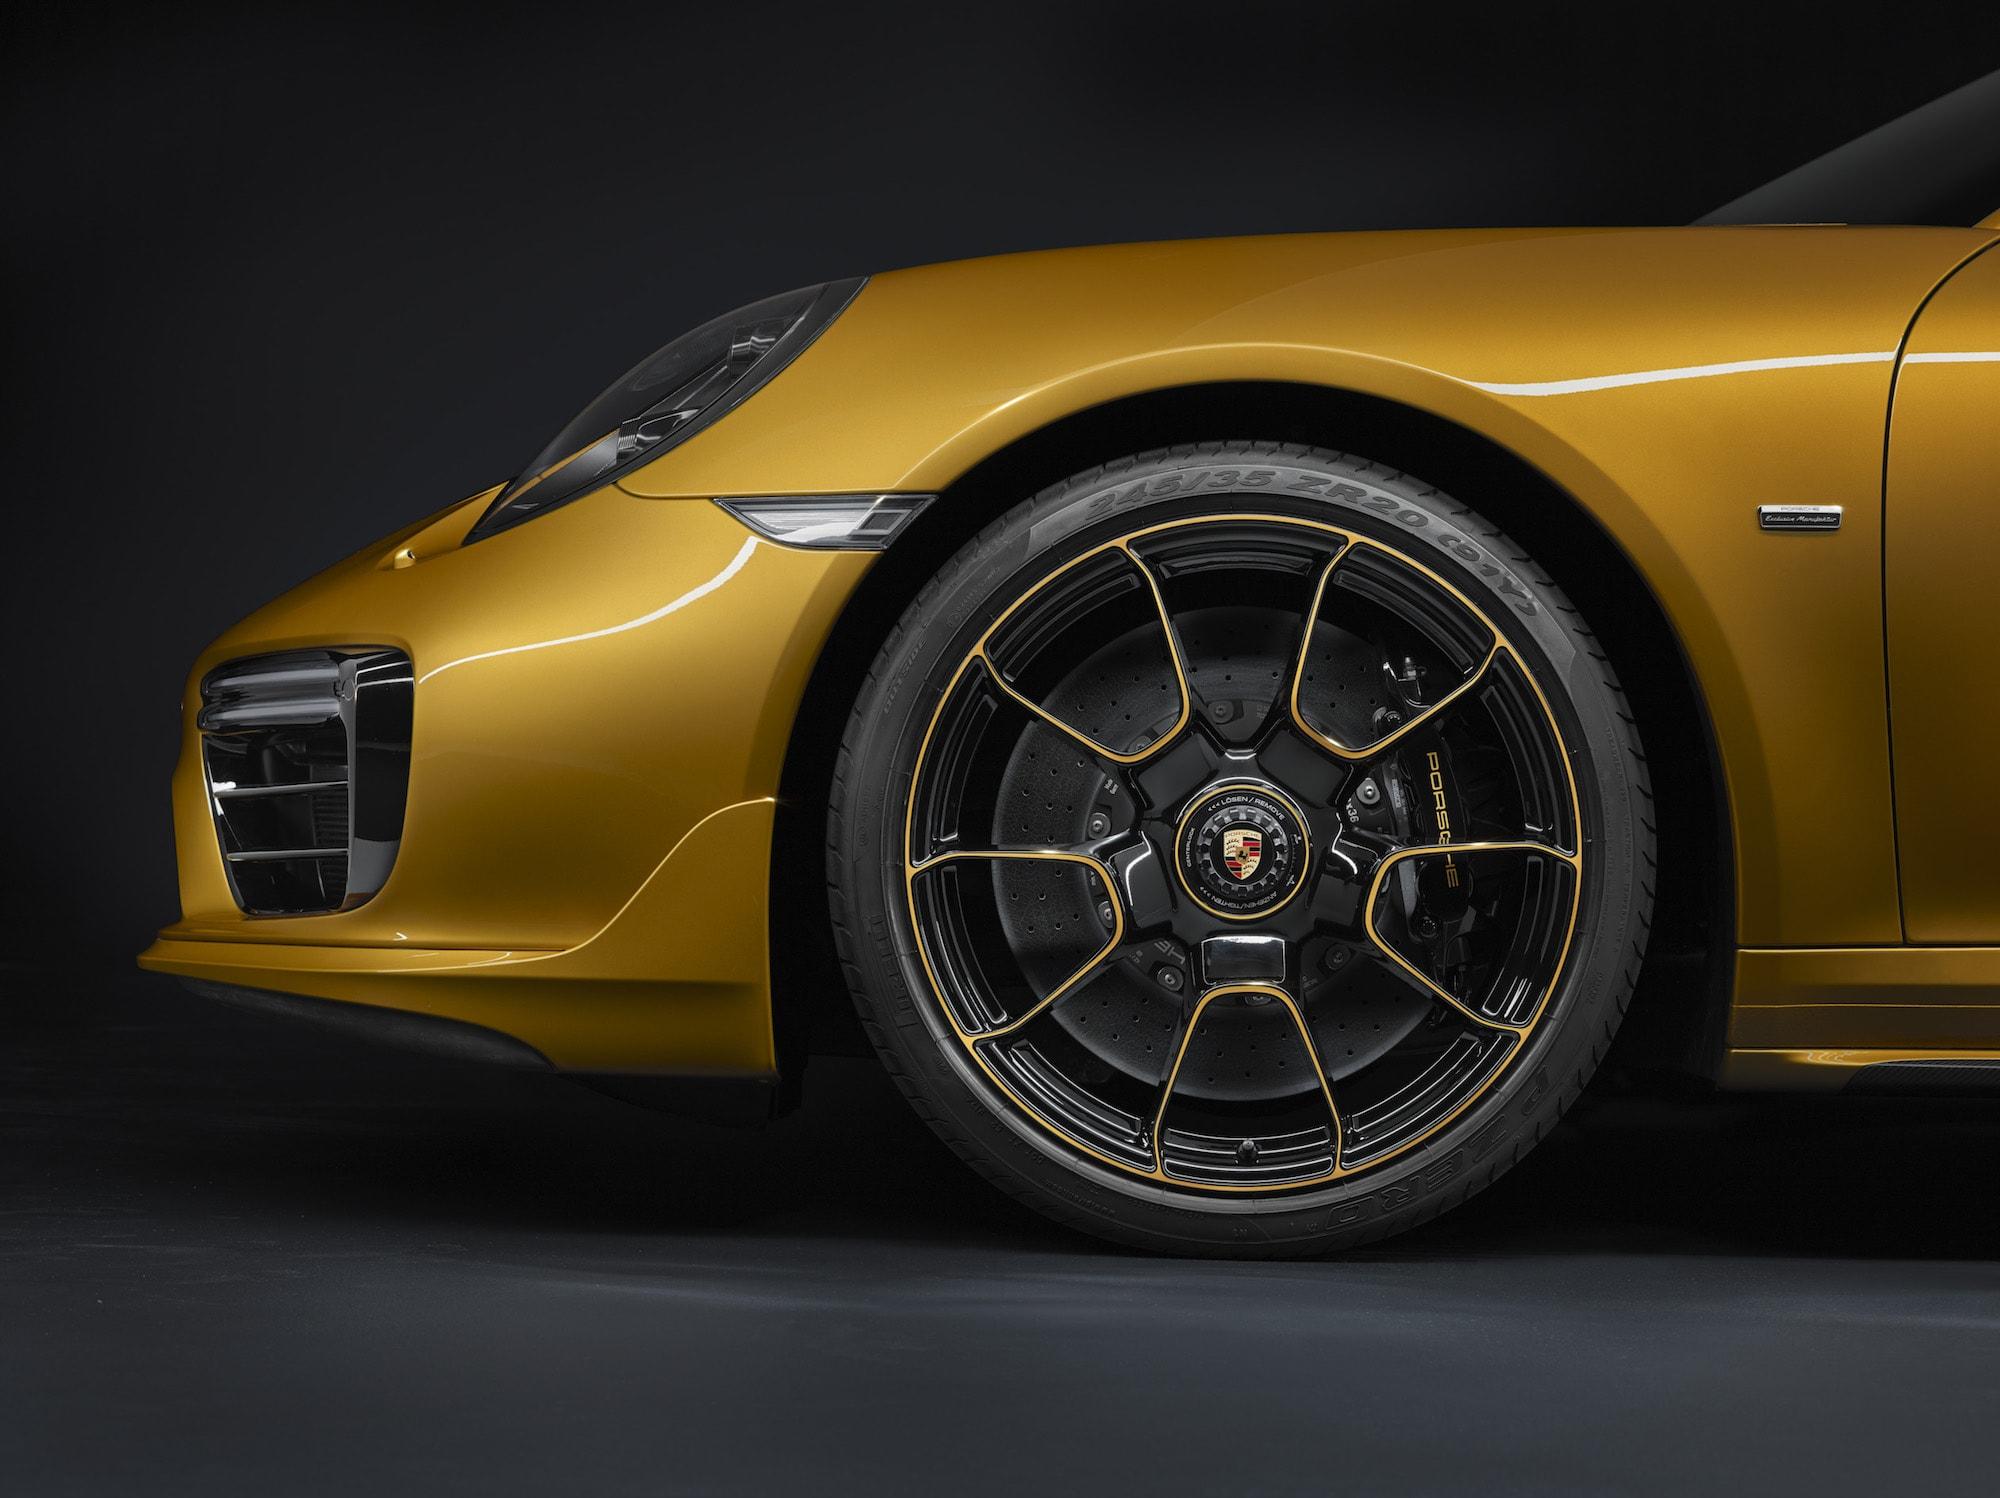 Echt goldig: Der Neue 911 Turbo S Exclusive Series 9